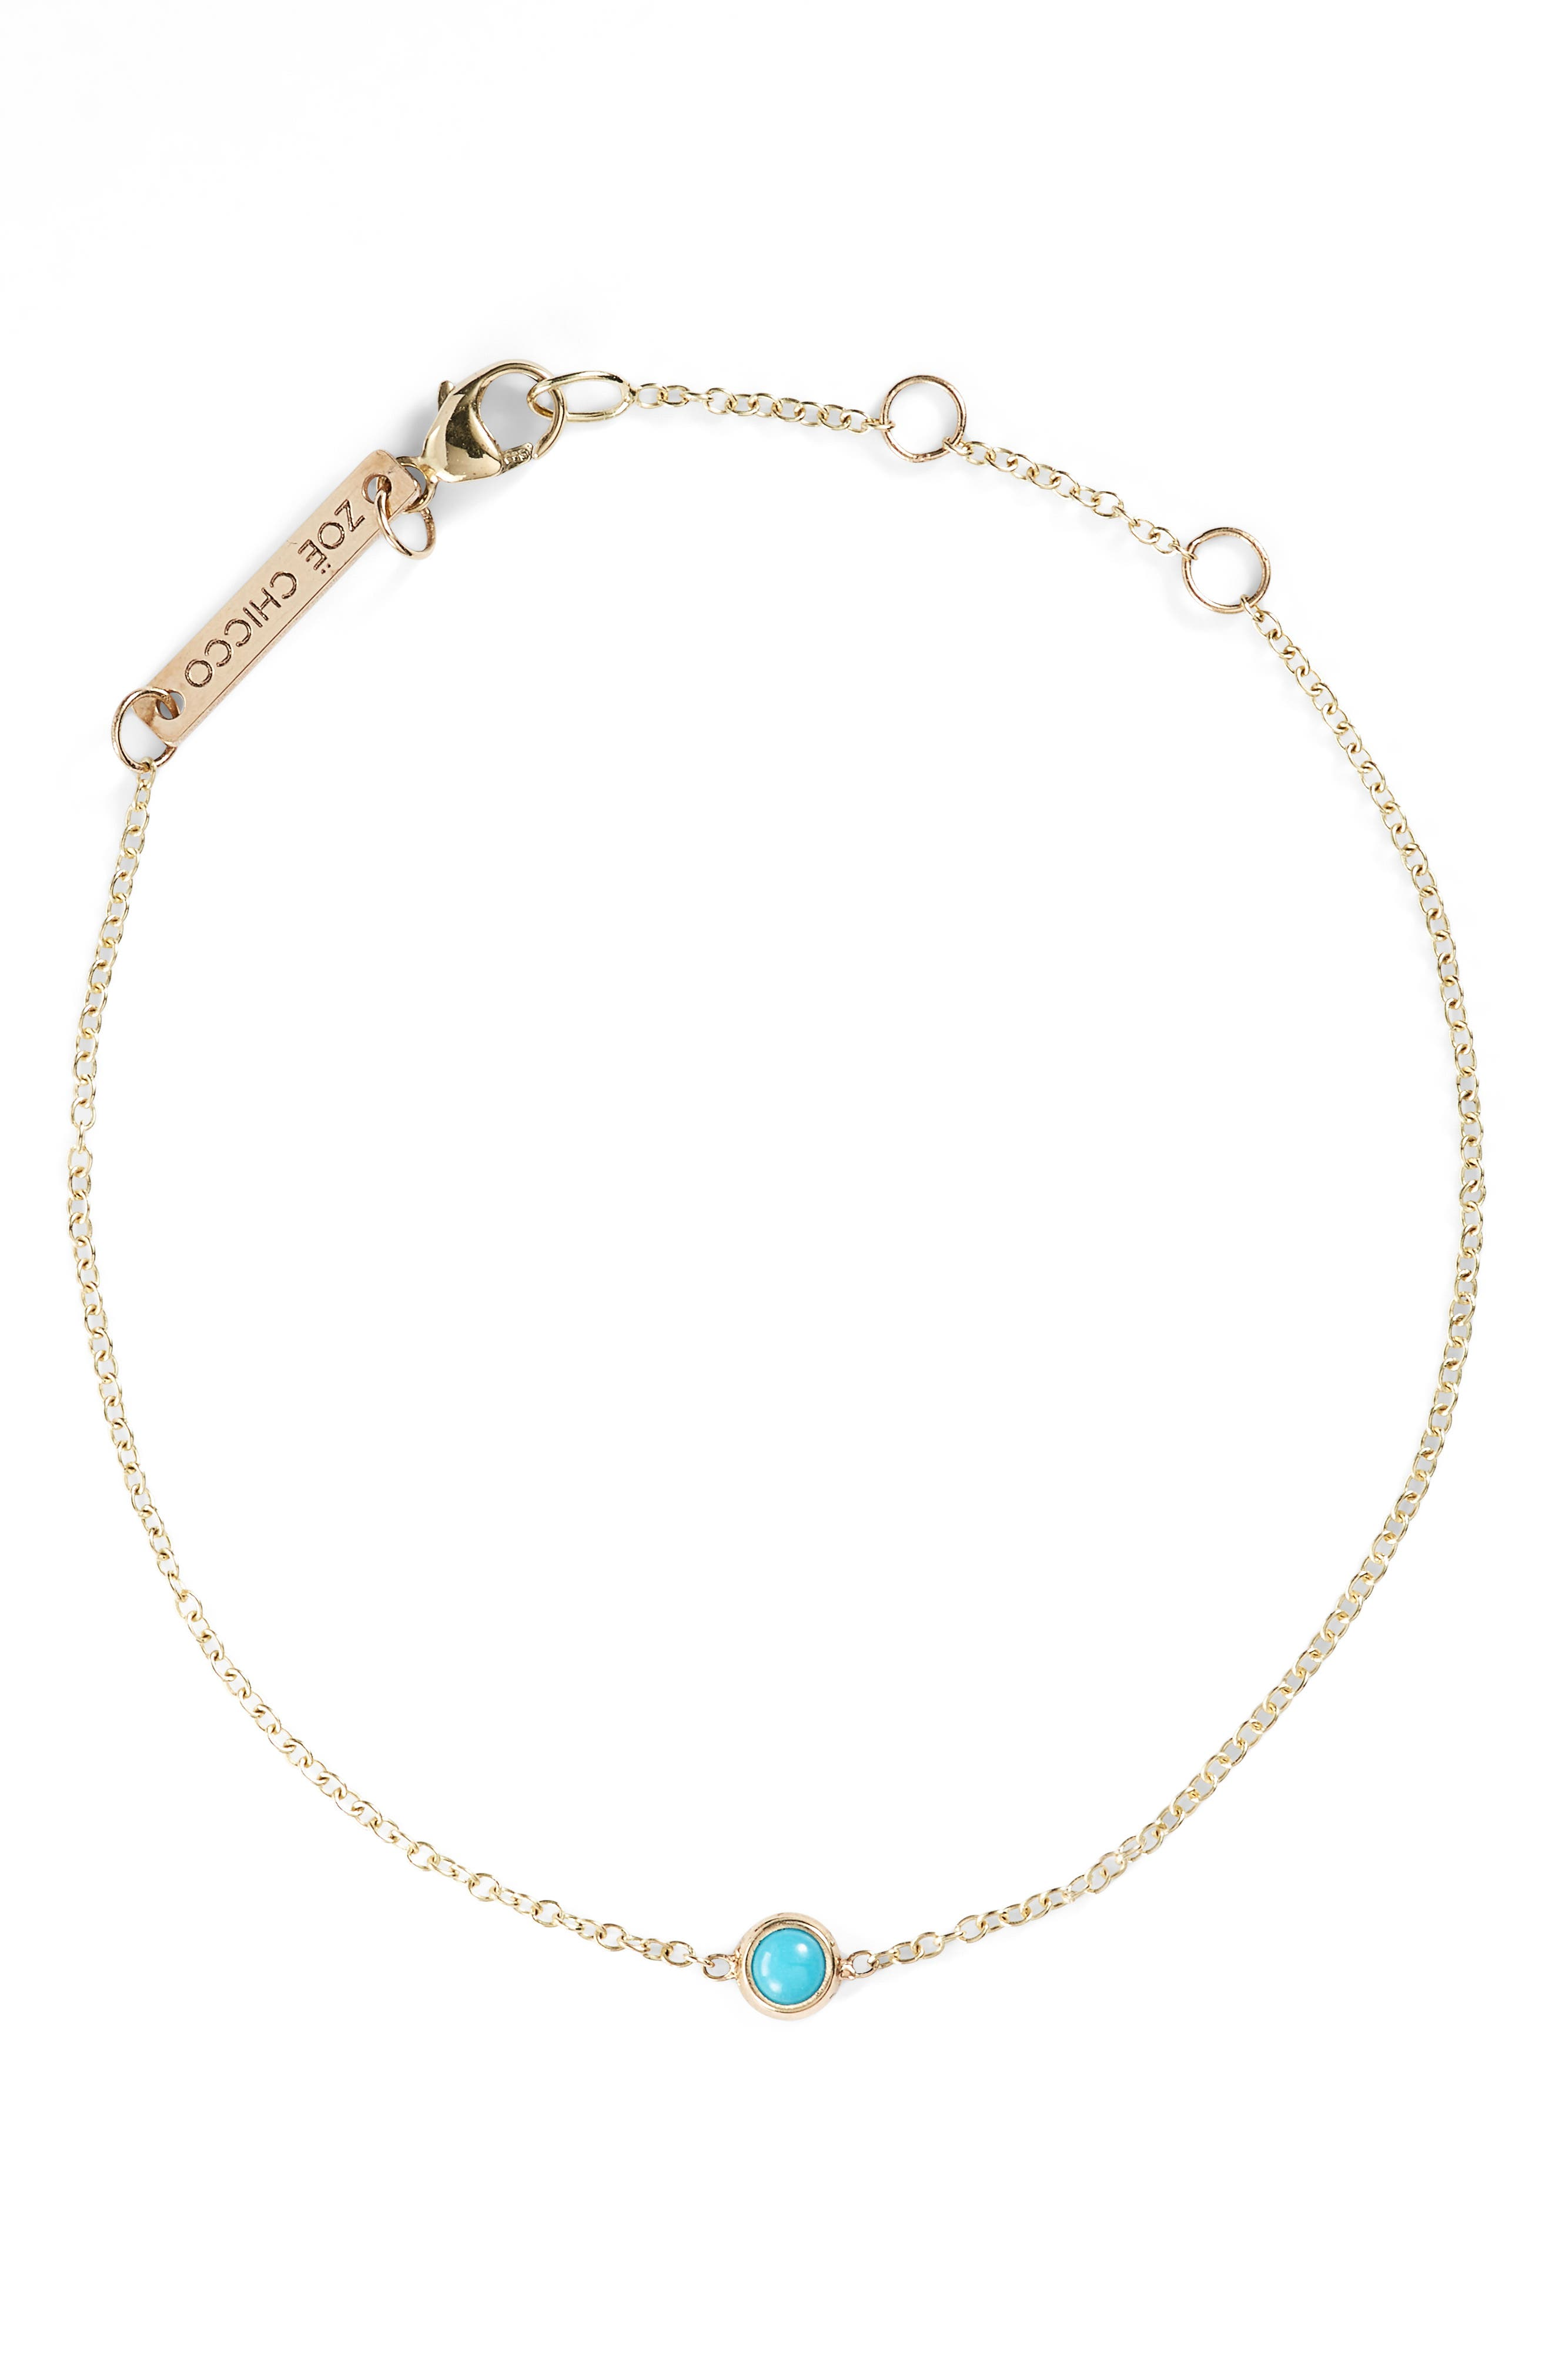 Turquoise Bezel Line Bracelet,                         Main,                         color, Yellow Gold/ Turquoise